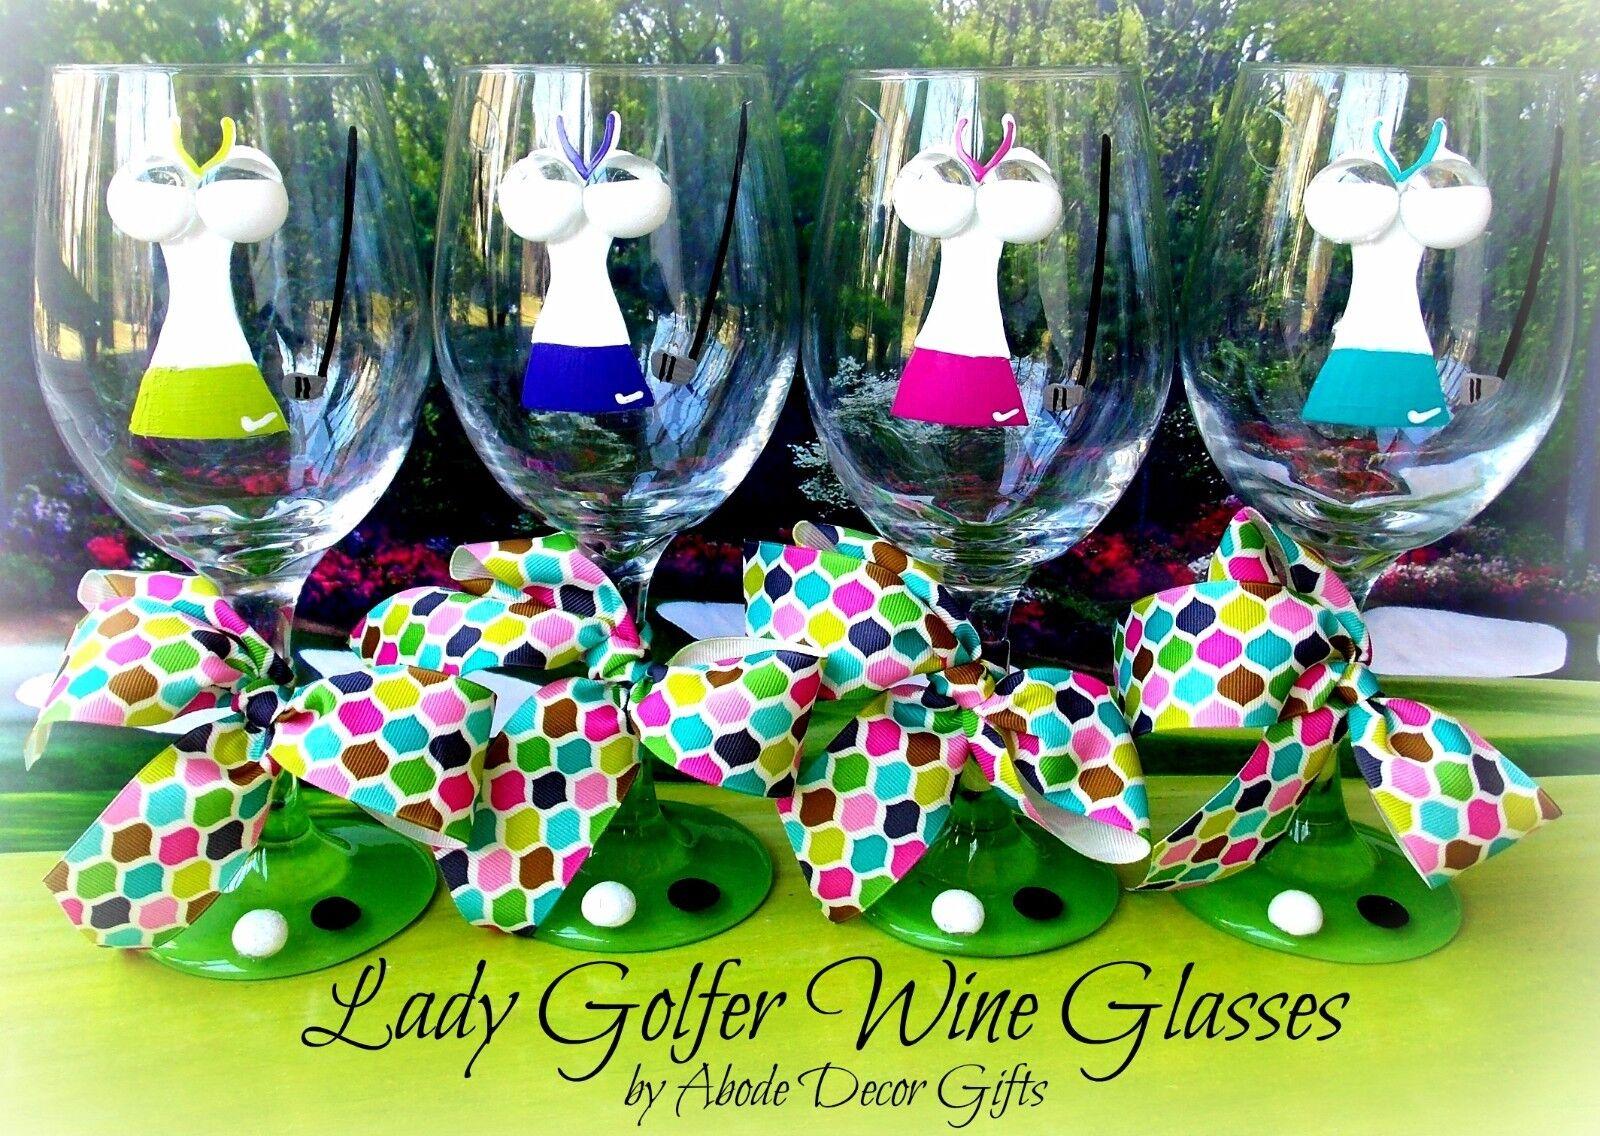 Golf Wine Glass Women Lady Golfer Unique Fun Ball Club Tourn